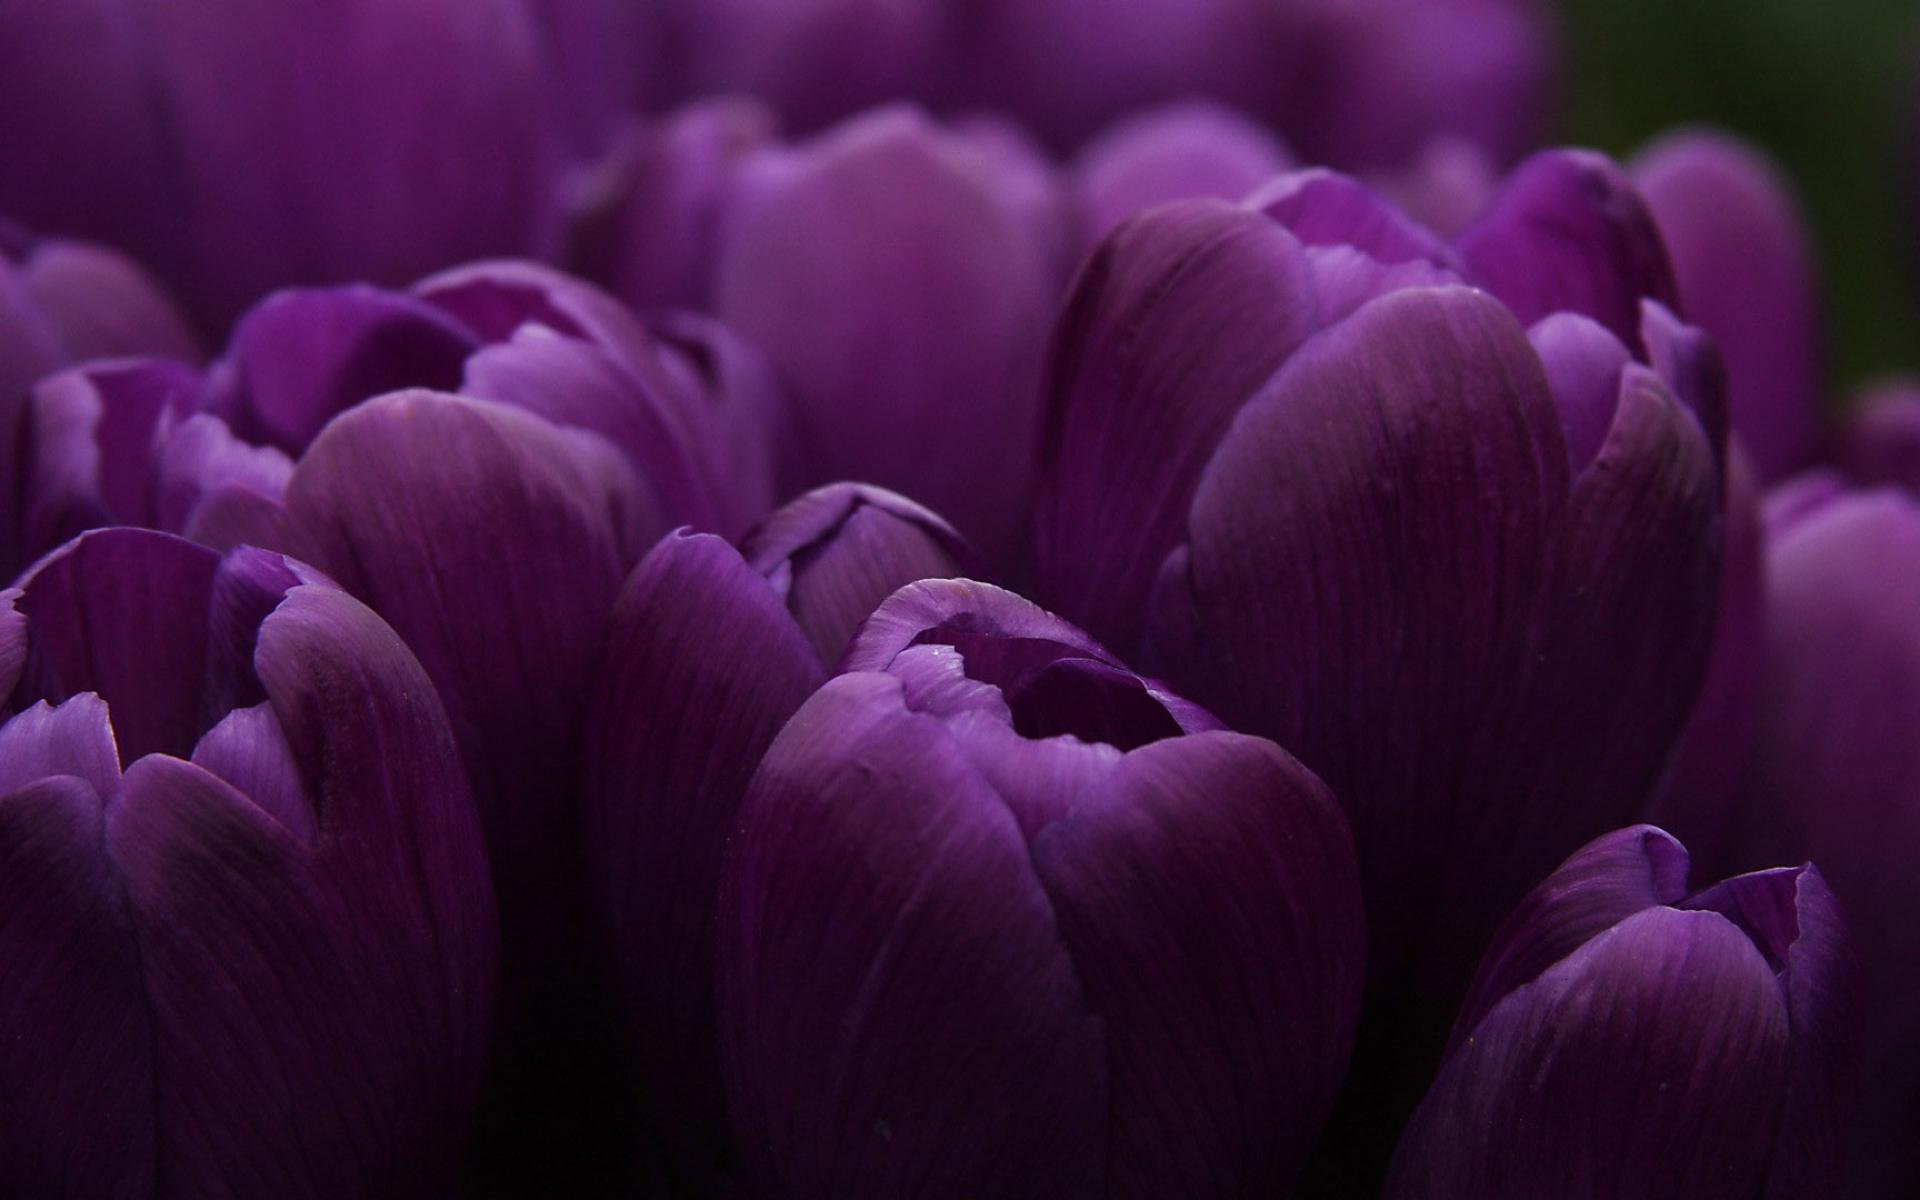 purple wallpaper 3 - photo #25